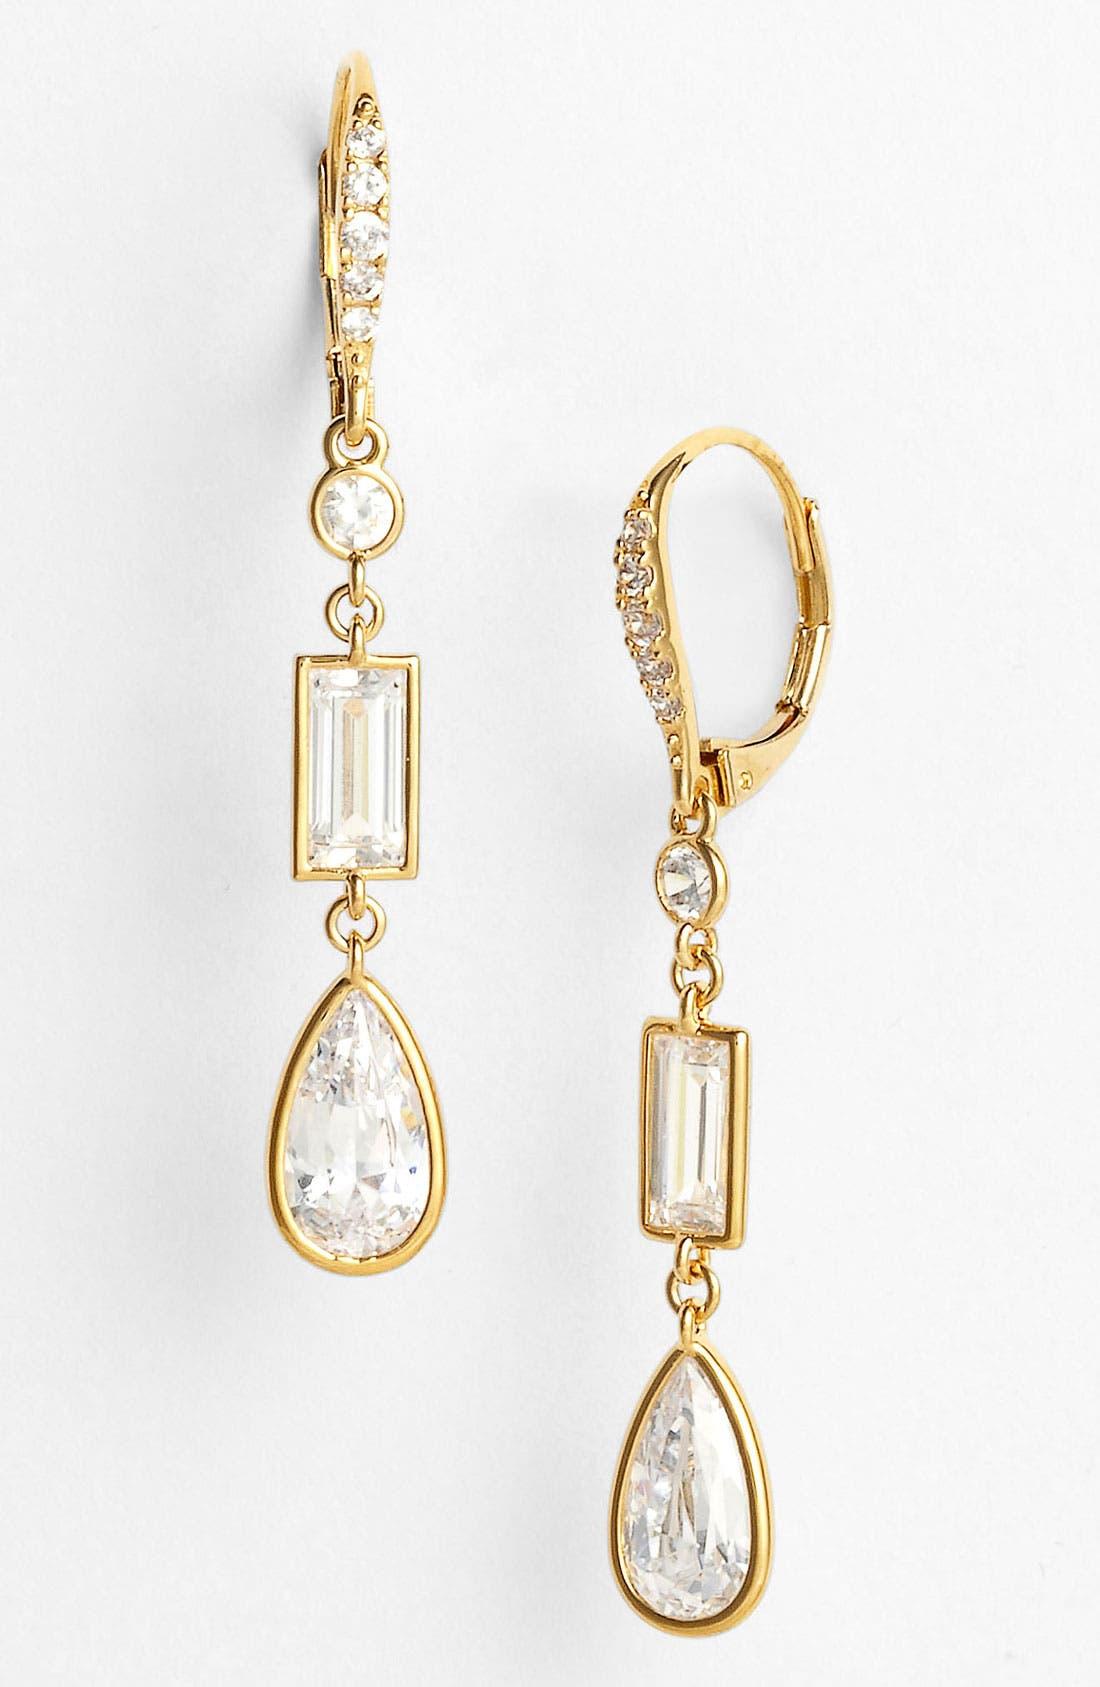 Alternate Image 1 Selected - Nadri Mixed Cut Cubic Zirconia Earrings (Nordstrom Exclusive)